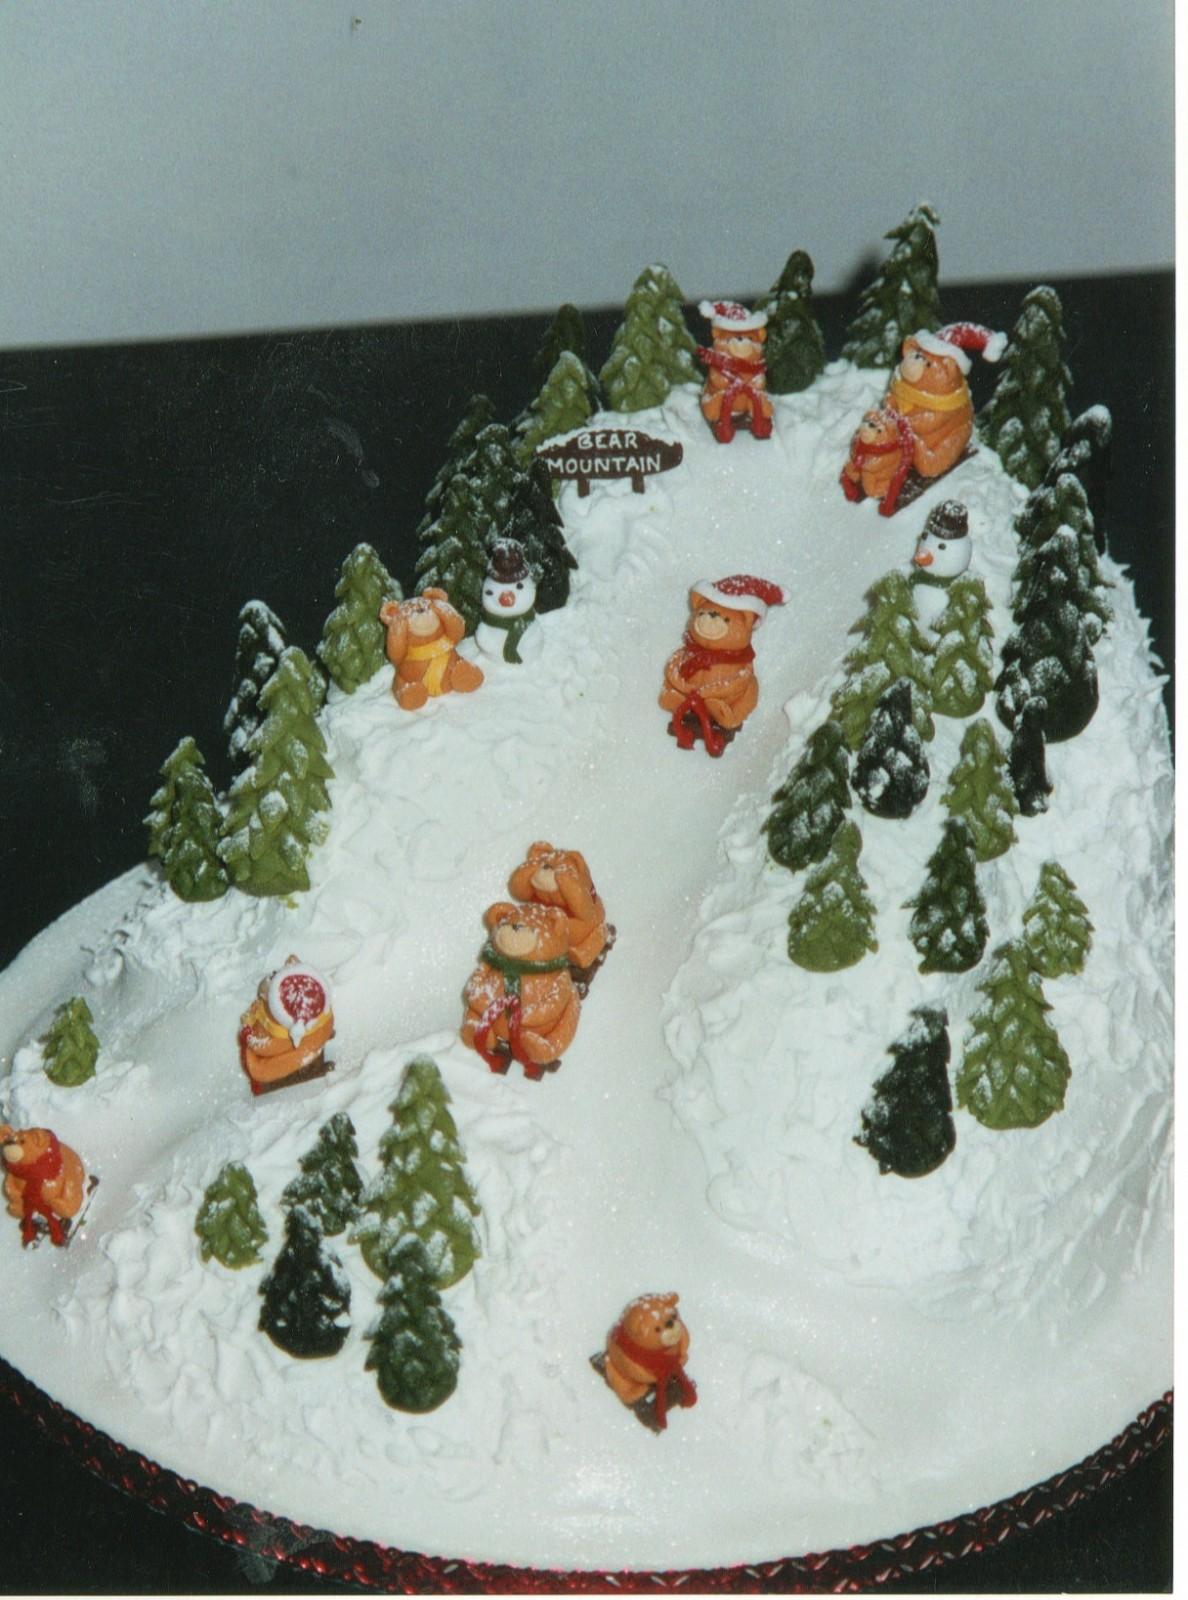 Christmas Cake New Design : Bear Mountain Novelty Christmas Cake   Susie s Cakes